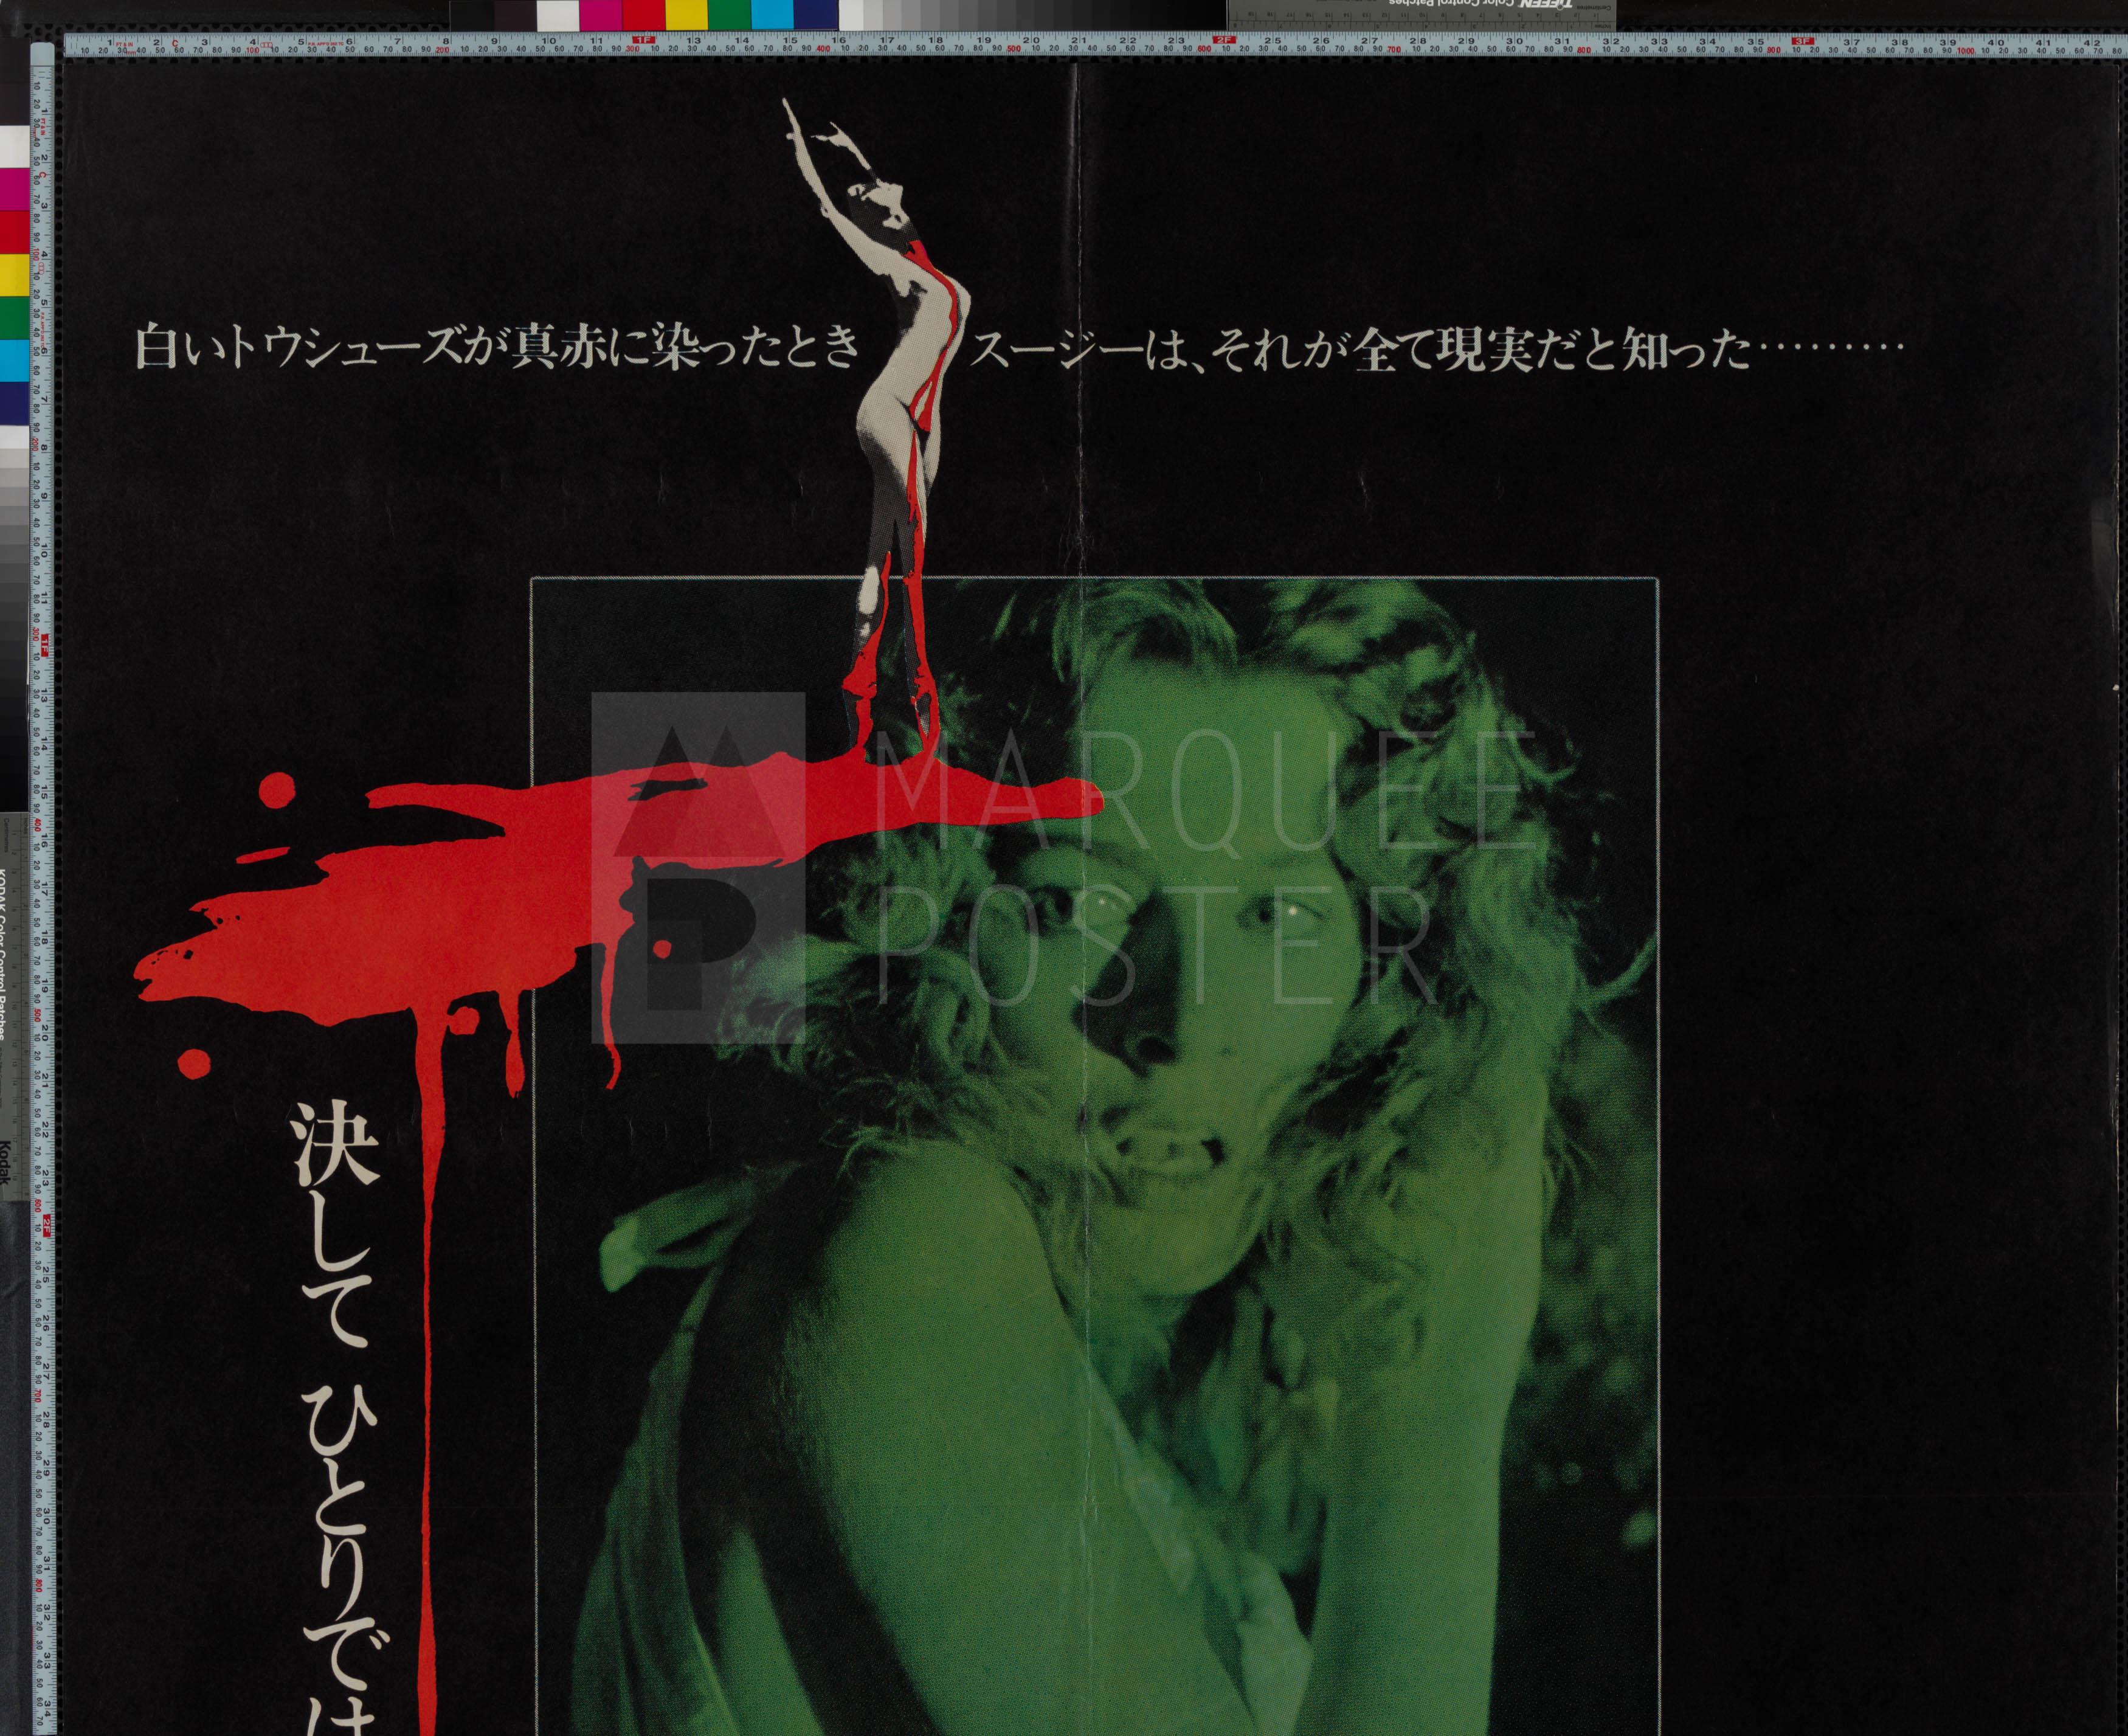 7-suspiria-japanese-b0-1977-02